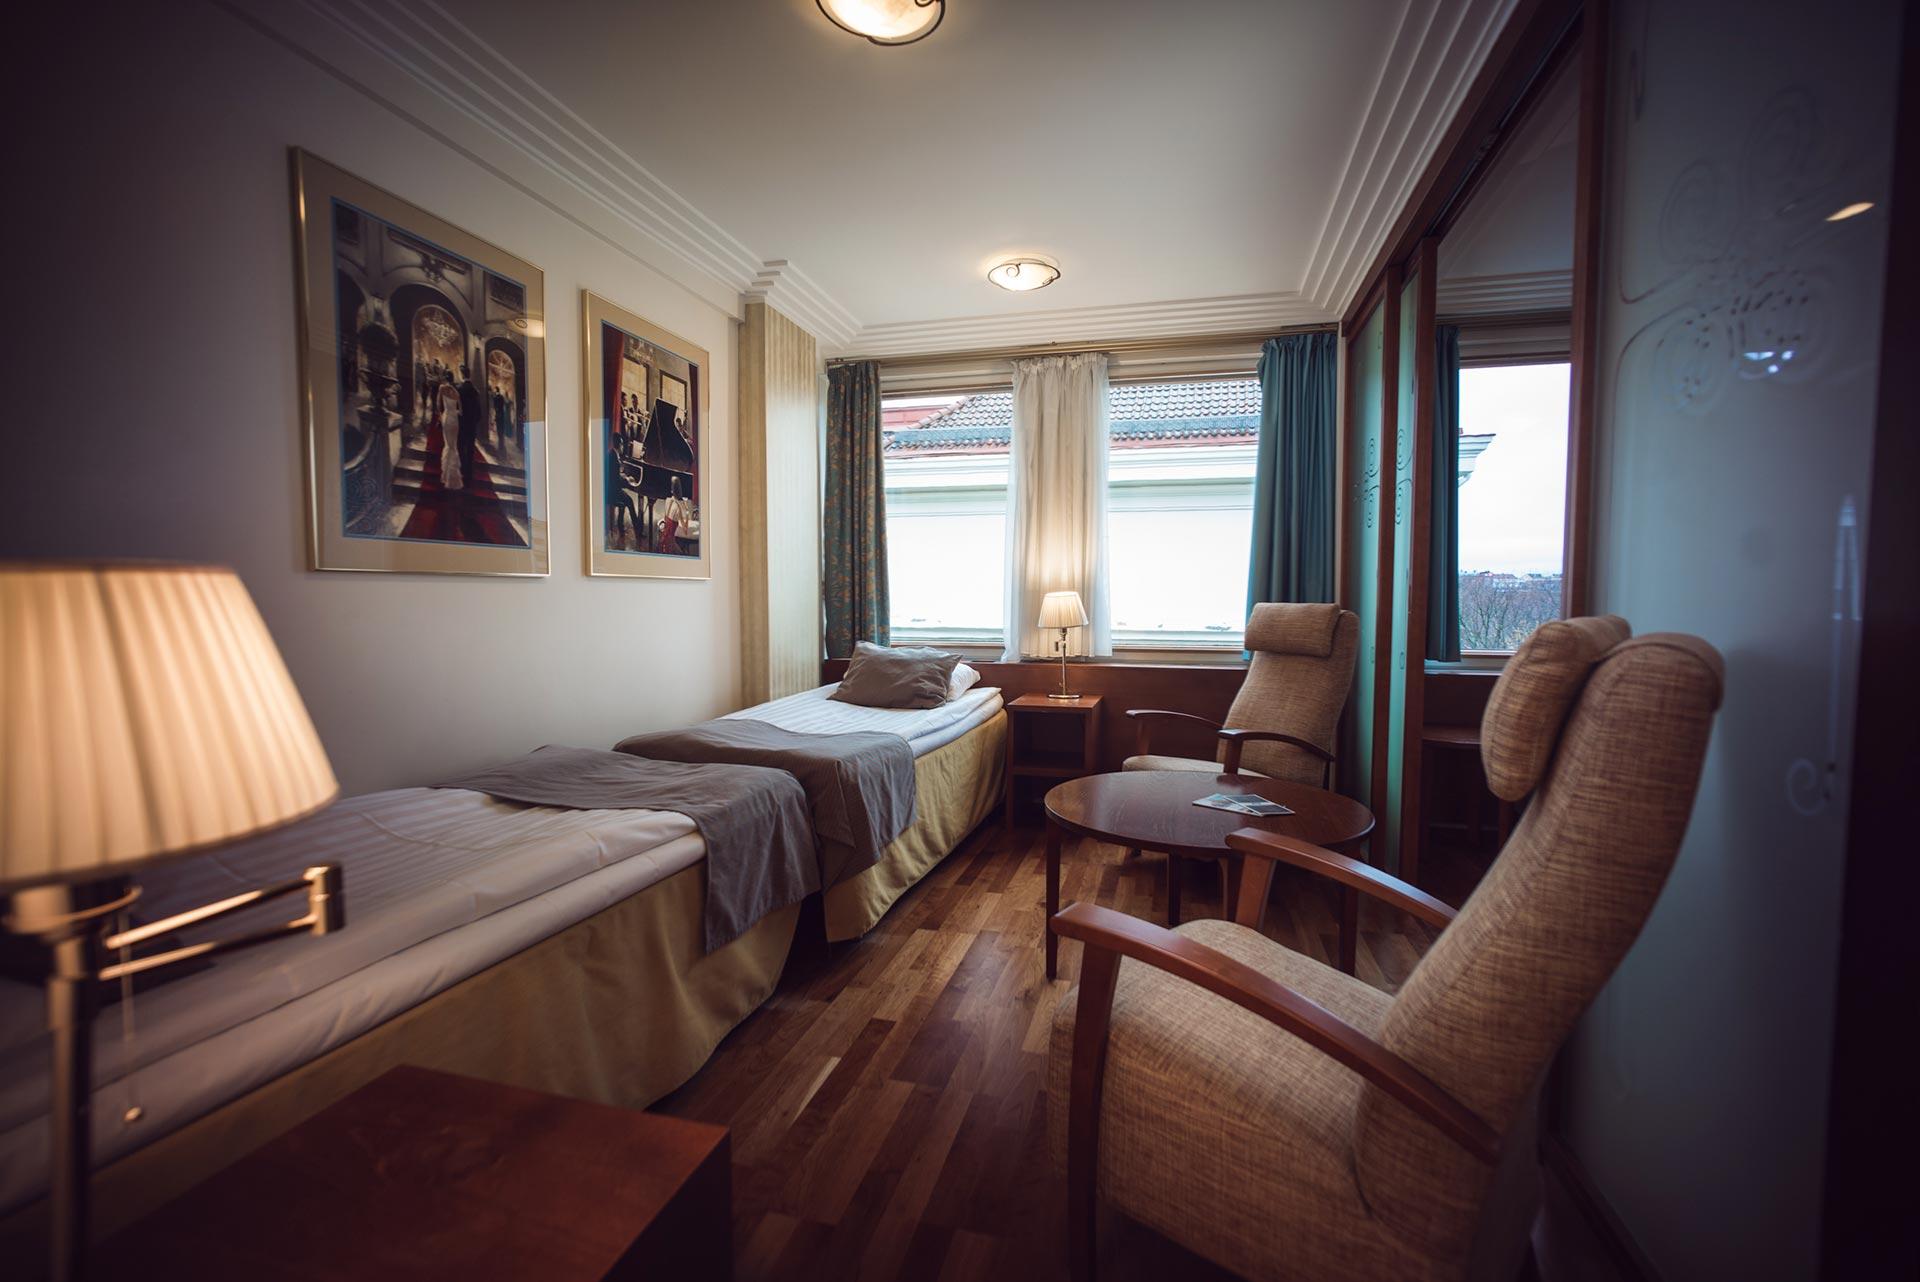 Hotel Arthur 4 hengen huone